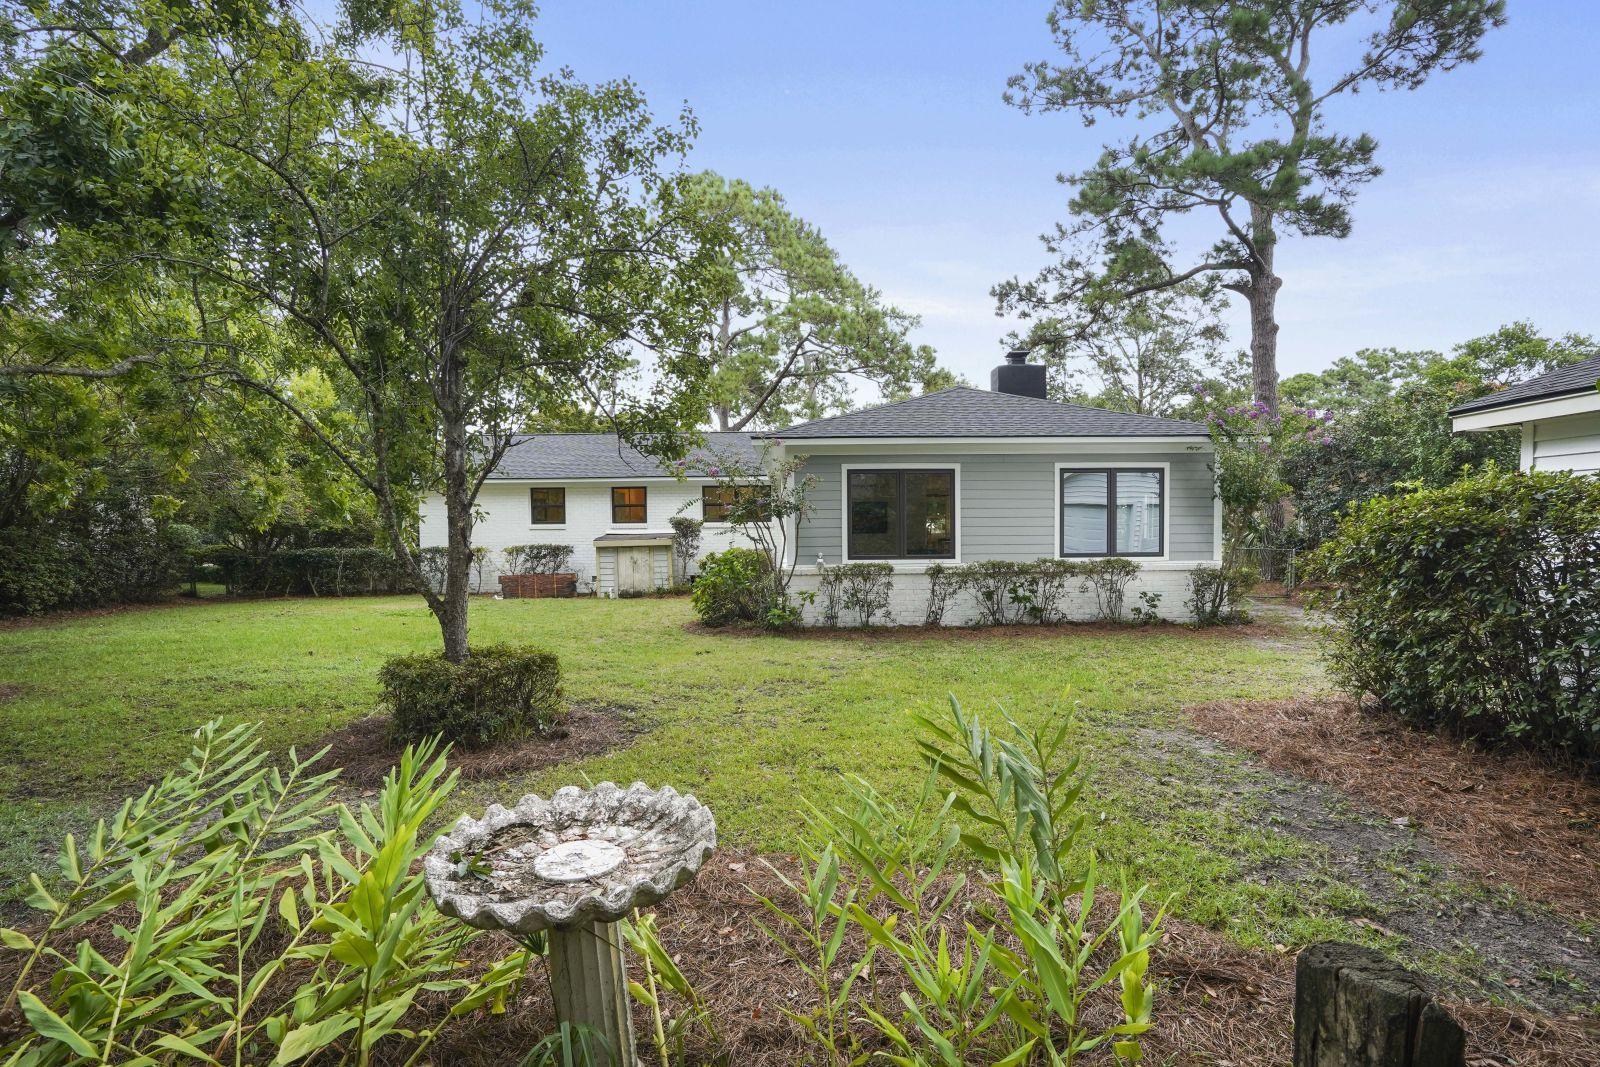 Cooper Estates Homes For Sale - 1059 Cottingham, Mount Pleasant, SC - 2